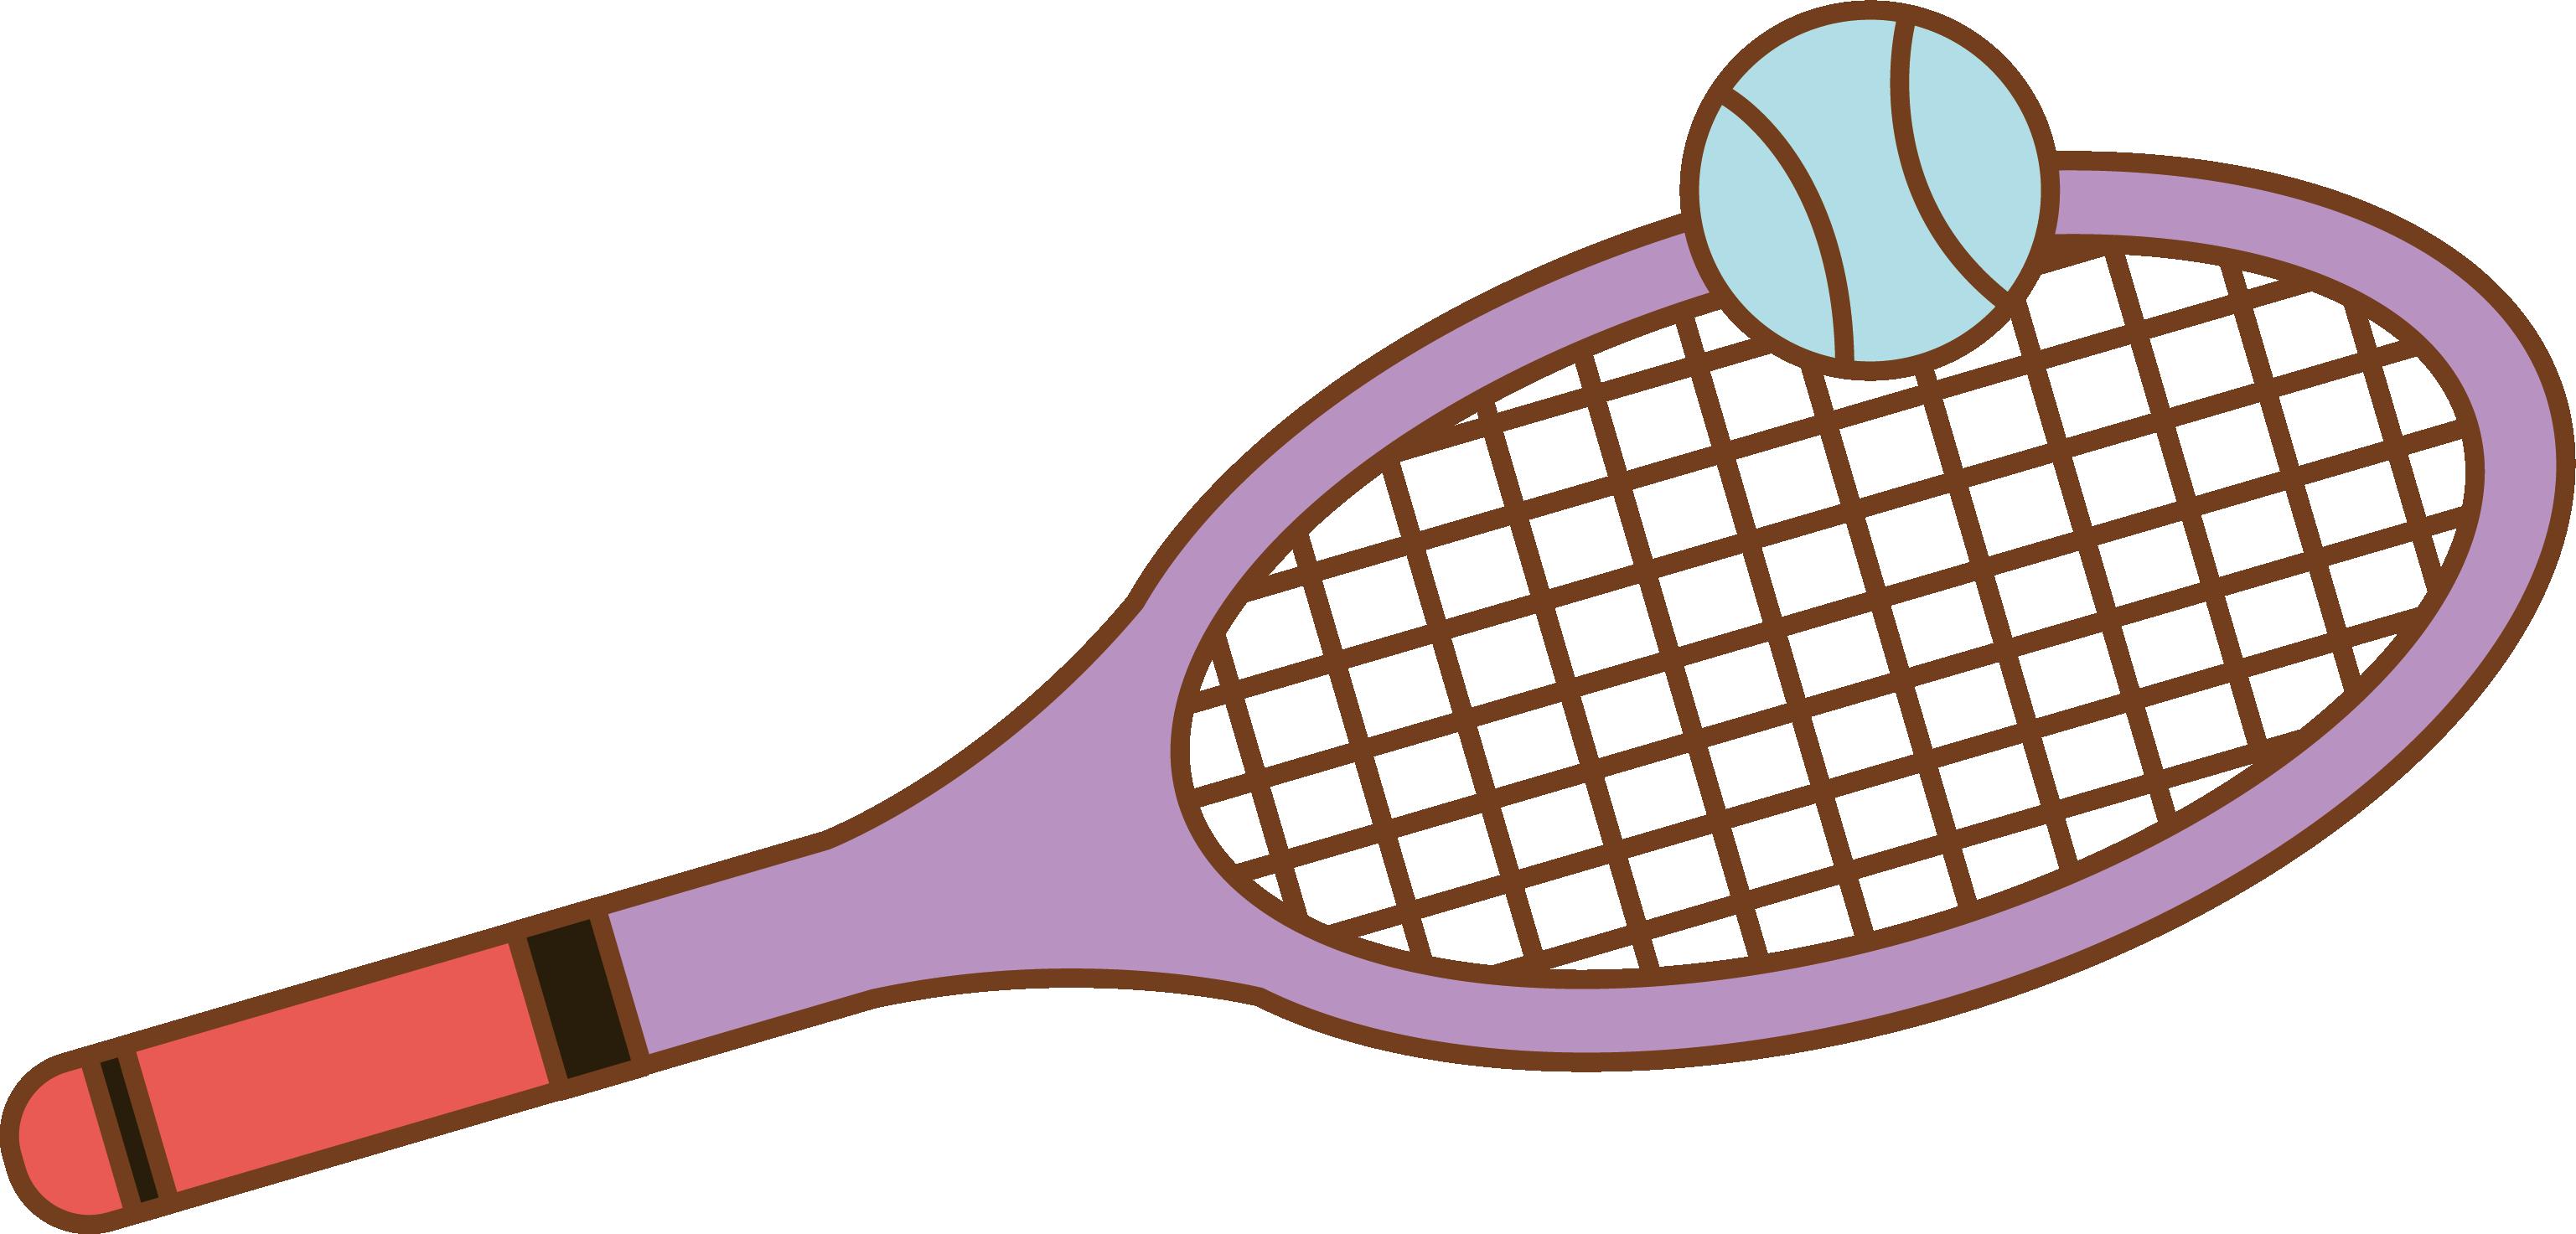 3074x1473 Tennis Badminton Racket Drawing